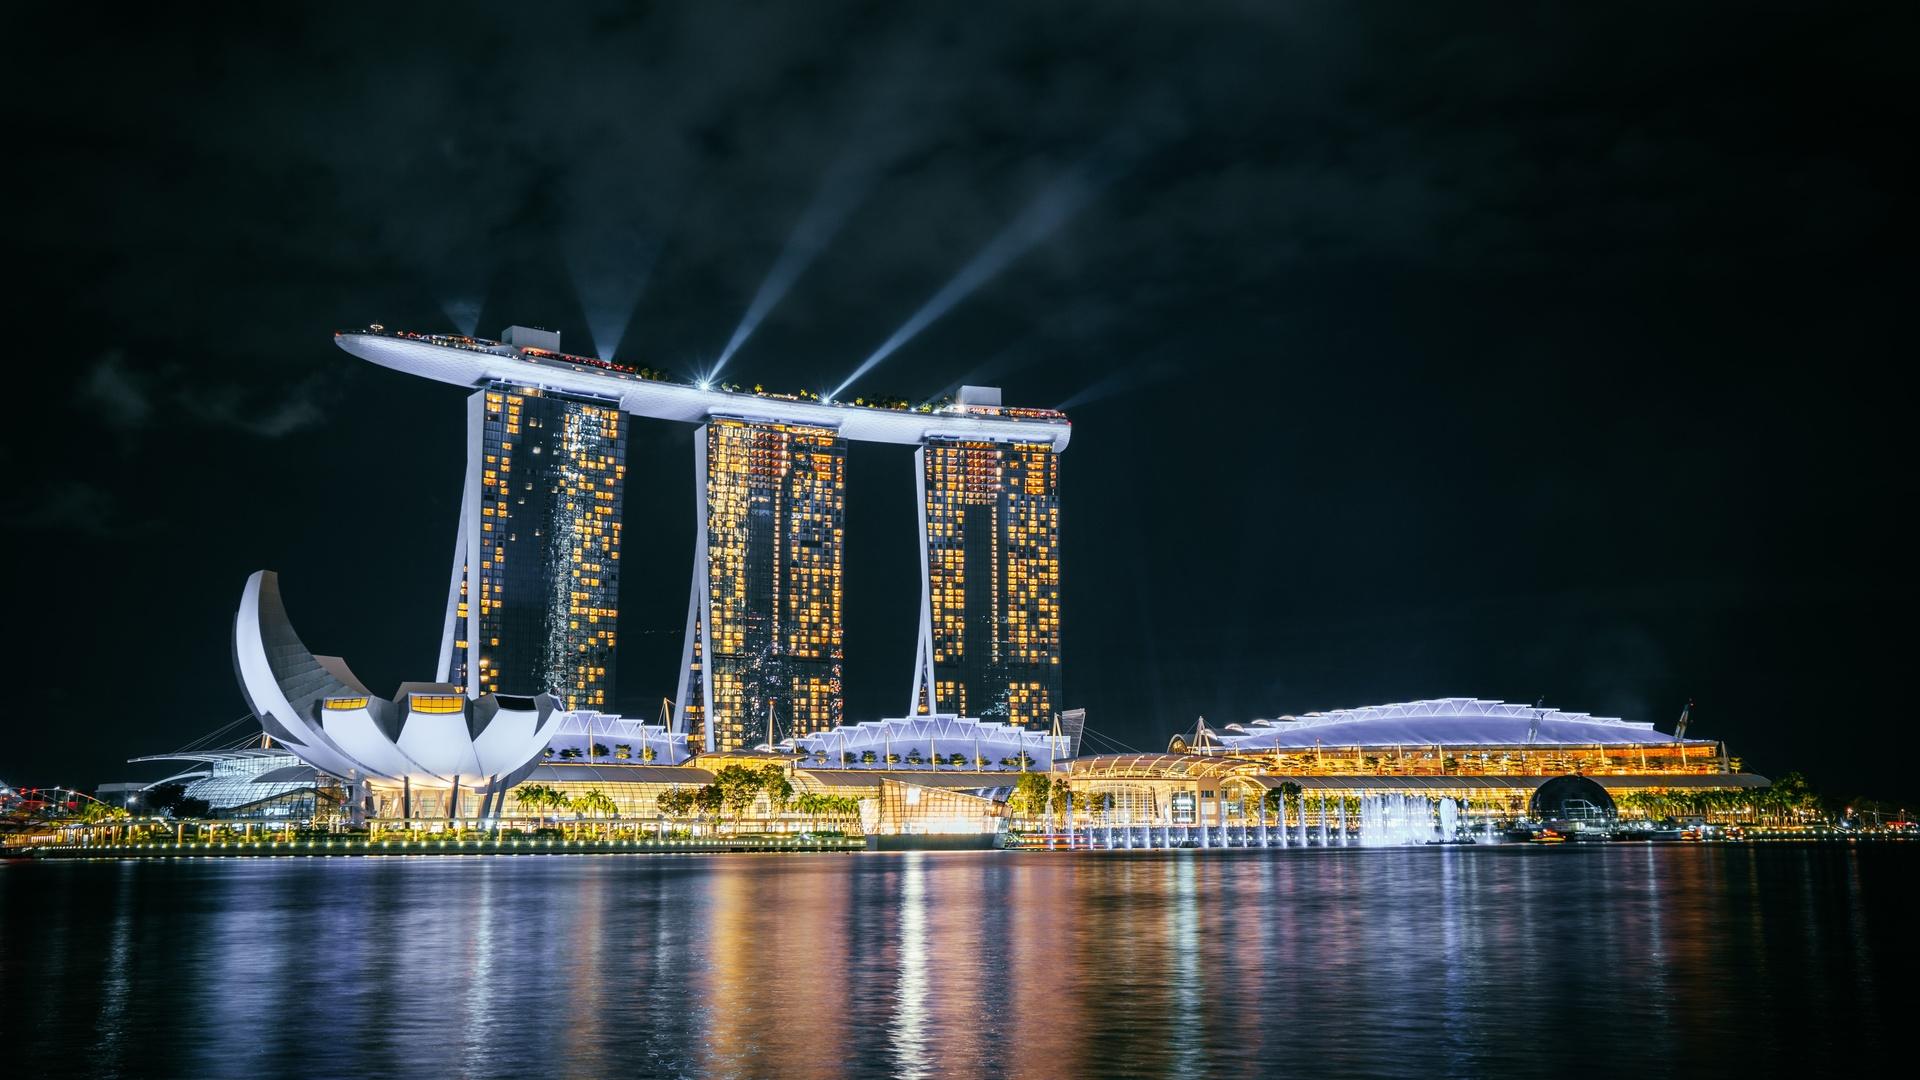 сингапур, marina bay sands, ночь